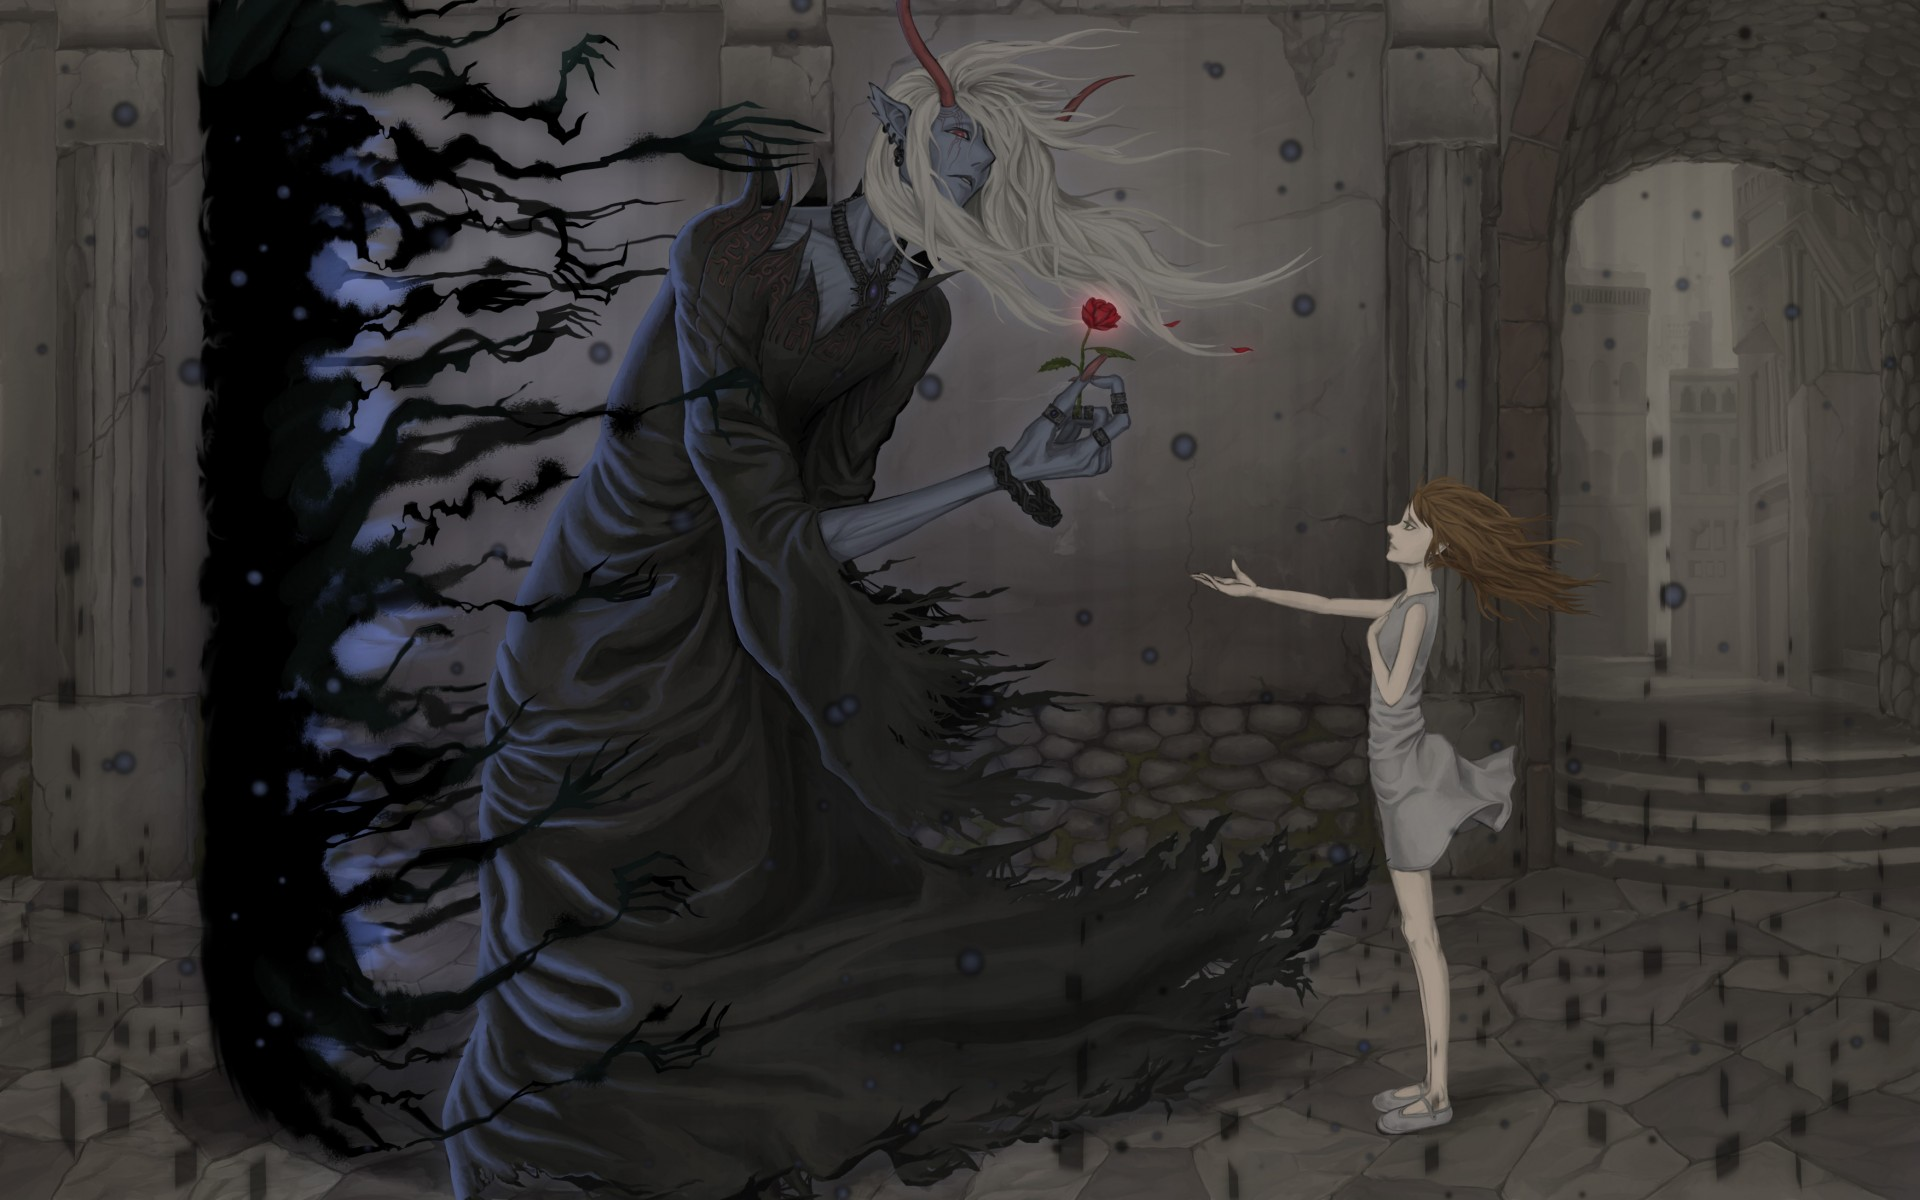 Original Anime Dark Fantasy Demon Girl Wallpaper